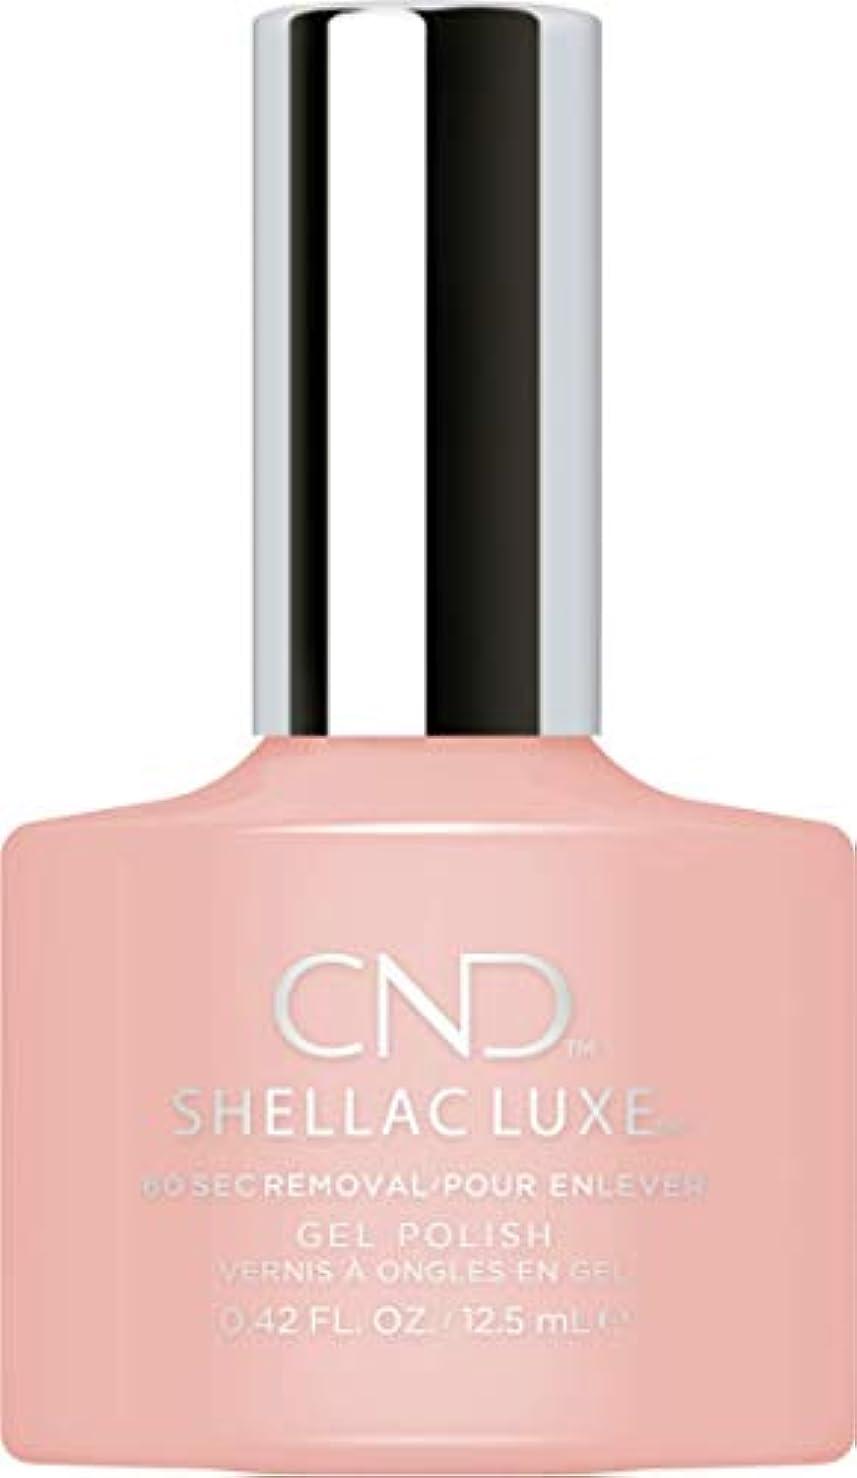 肯定的銀行論争の的CND Shellac Luxe - Uncovered - 12.5 ml / 0.42 oz